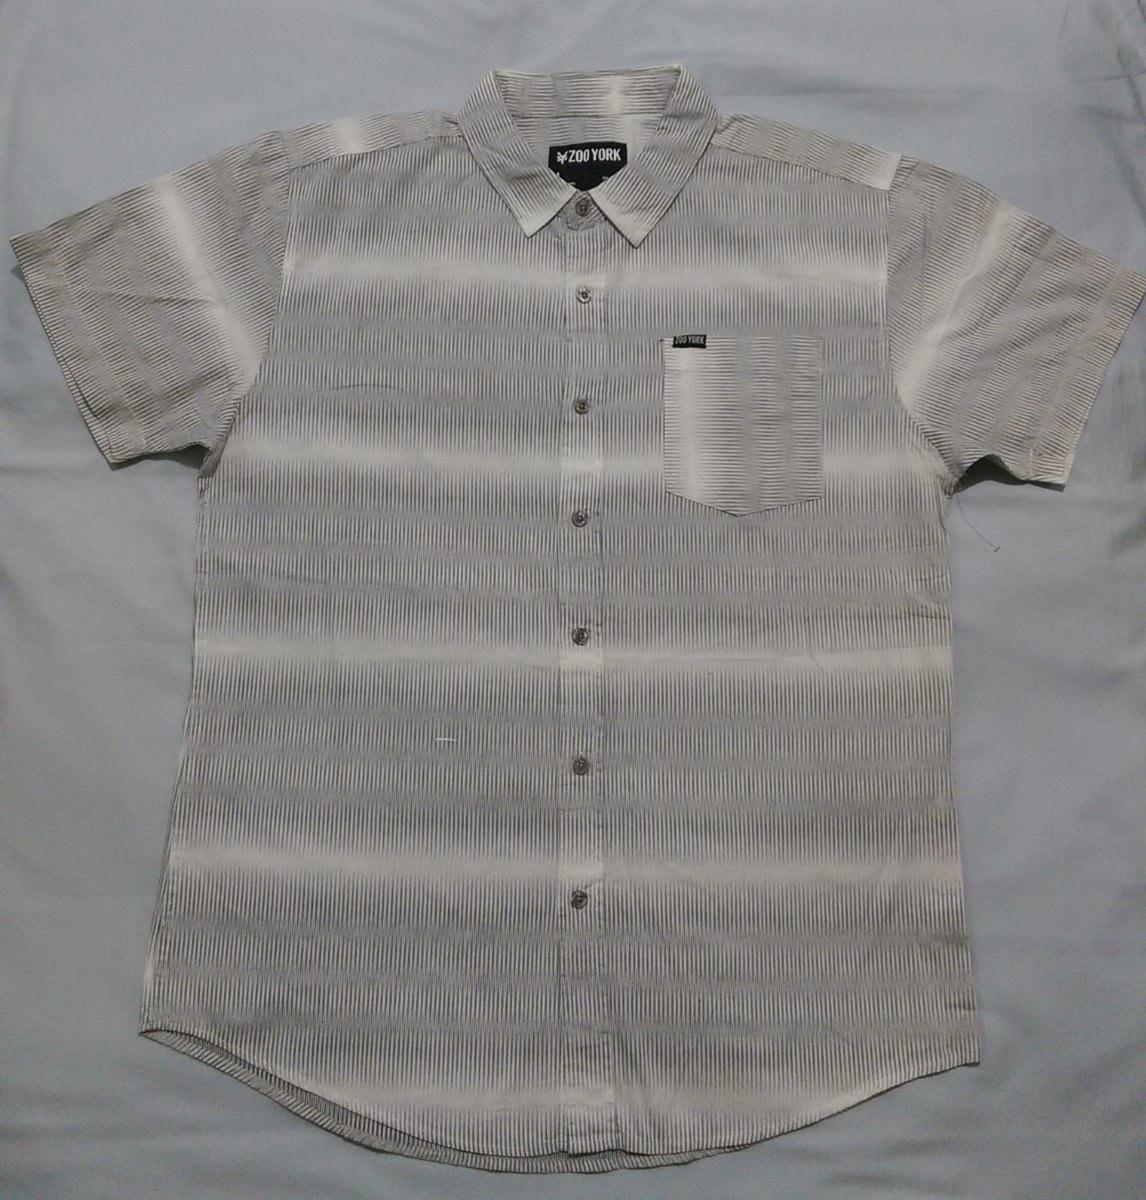 Camisa Zoo York Para Hombre -   450.00 en Mercado Libre 8f7f07cc6c22